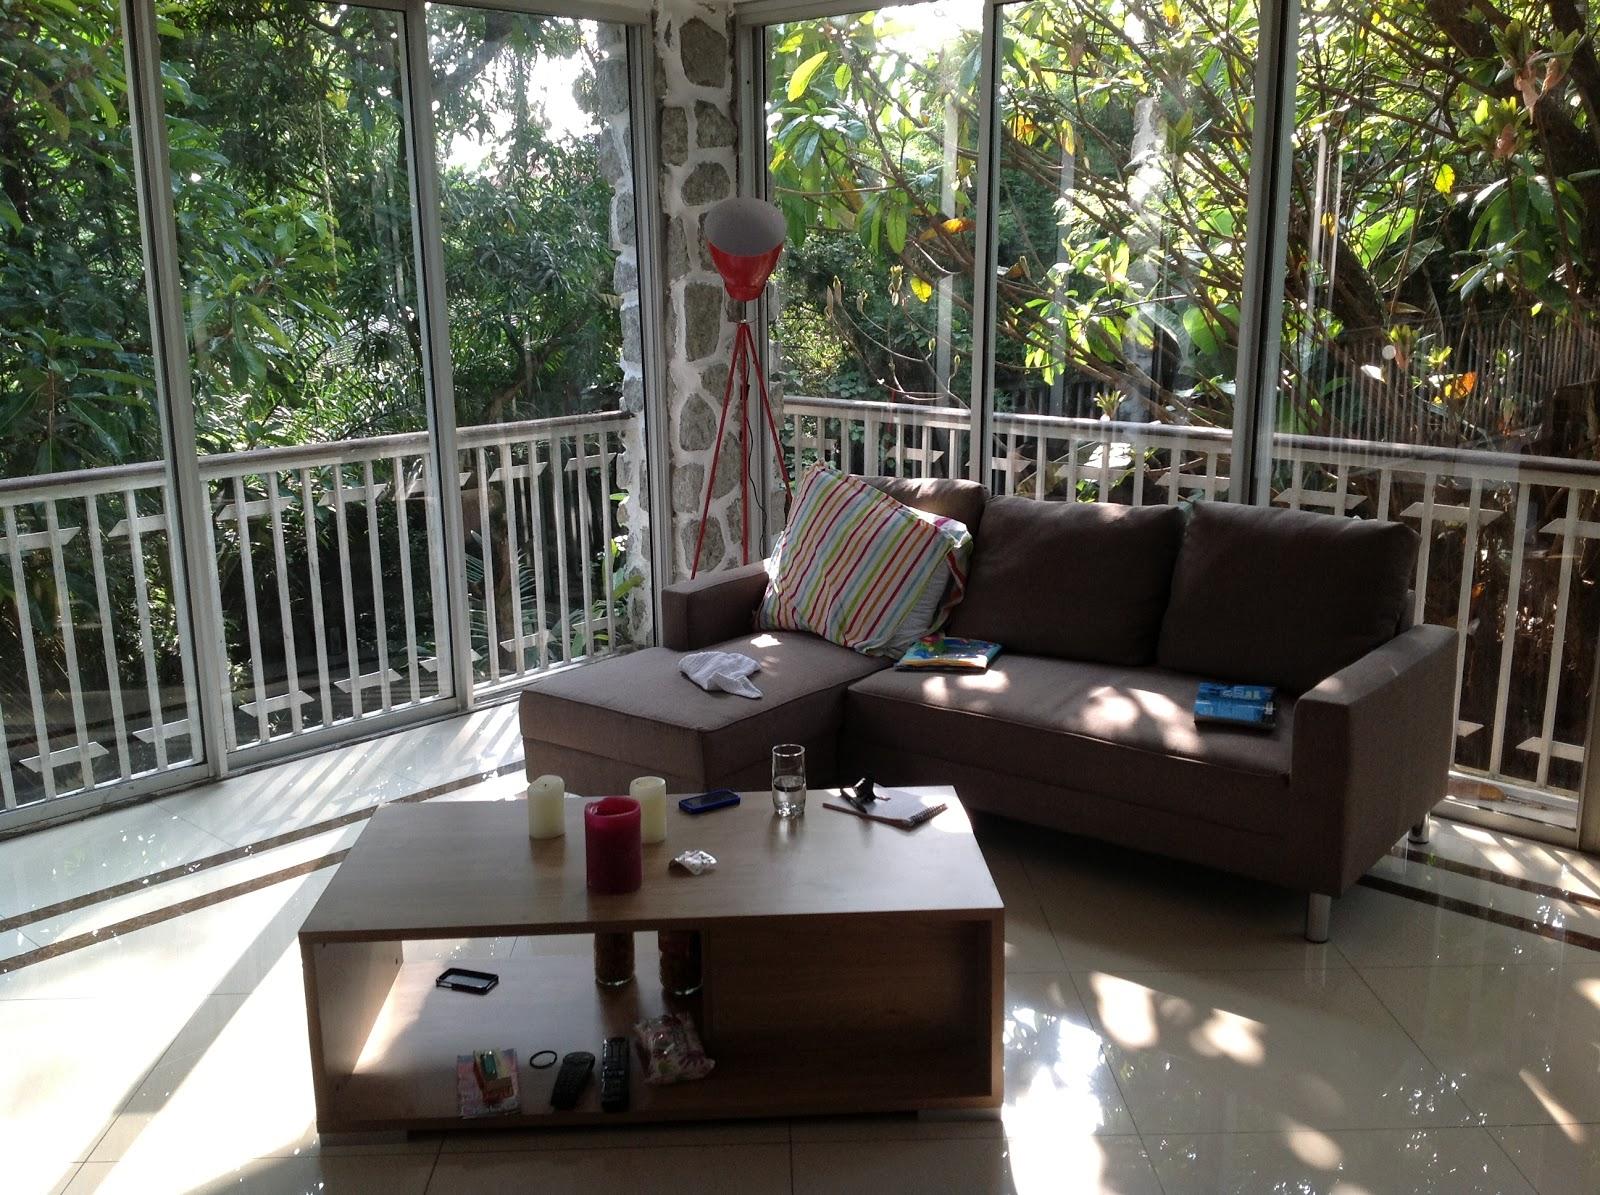 construire une v randa sans autorisation. Black Bedroom Furniture Sets. Home Design Ideas